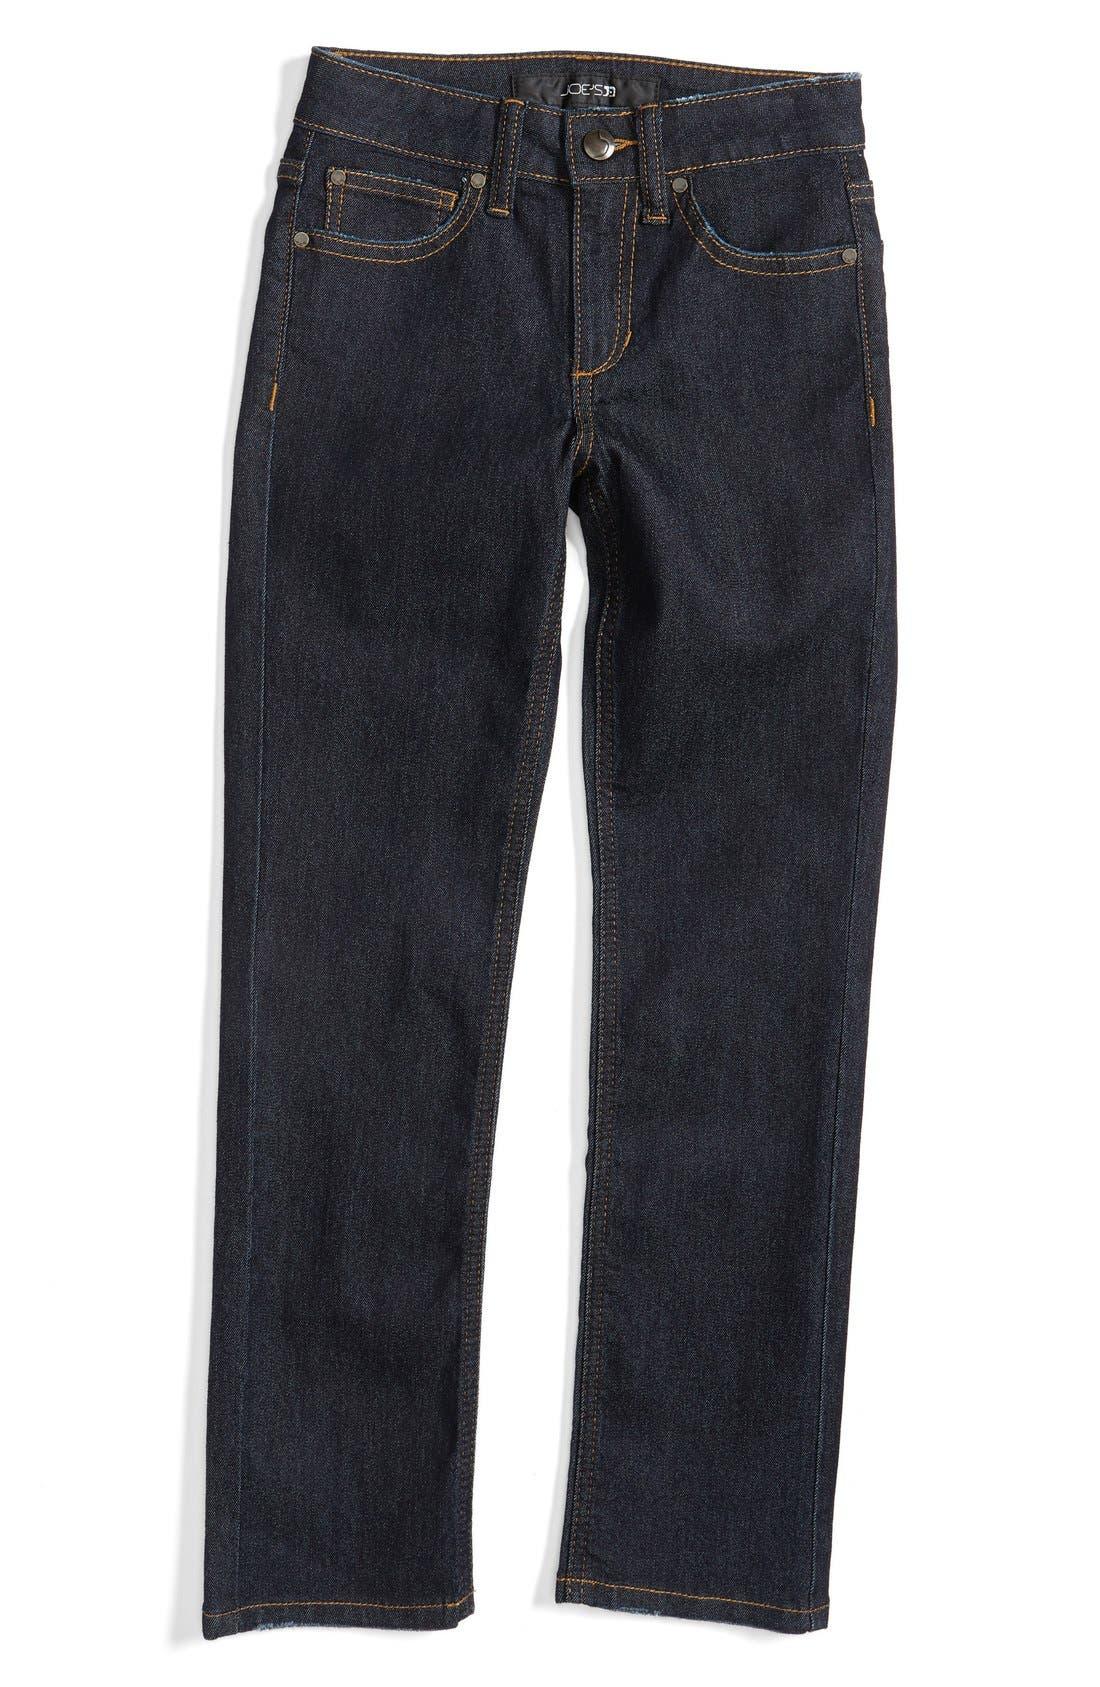 Main Image - Joe's Brixton Straight Leg Jeans (Toddler Boys & Little Boys)